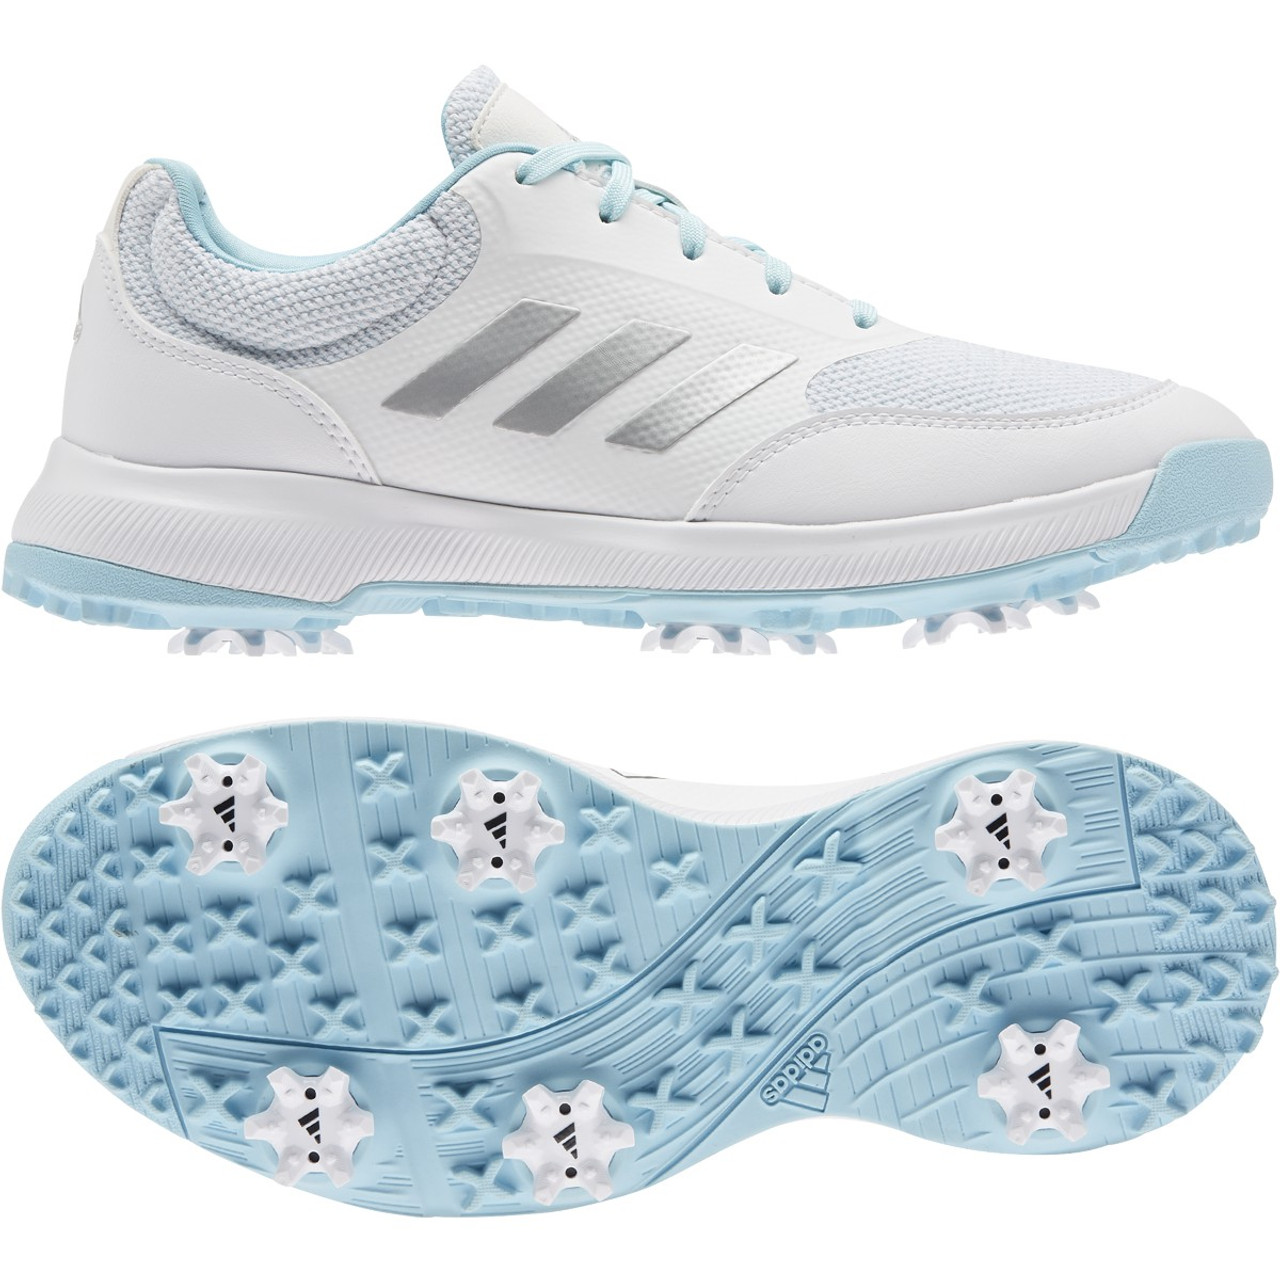 Adidas Womens Tech Response Golf Shoes - White / Silver / Hazy Sky